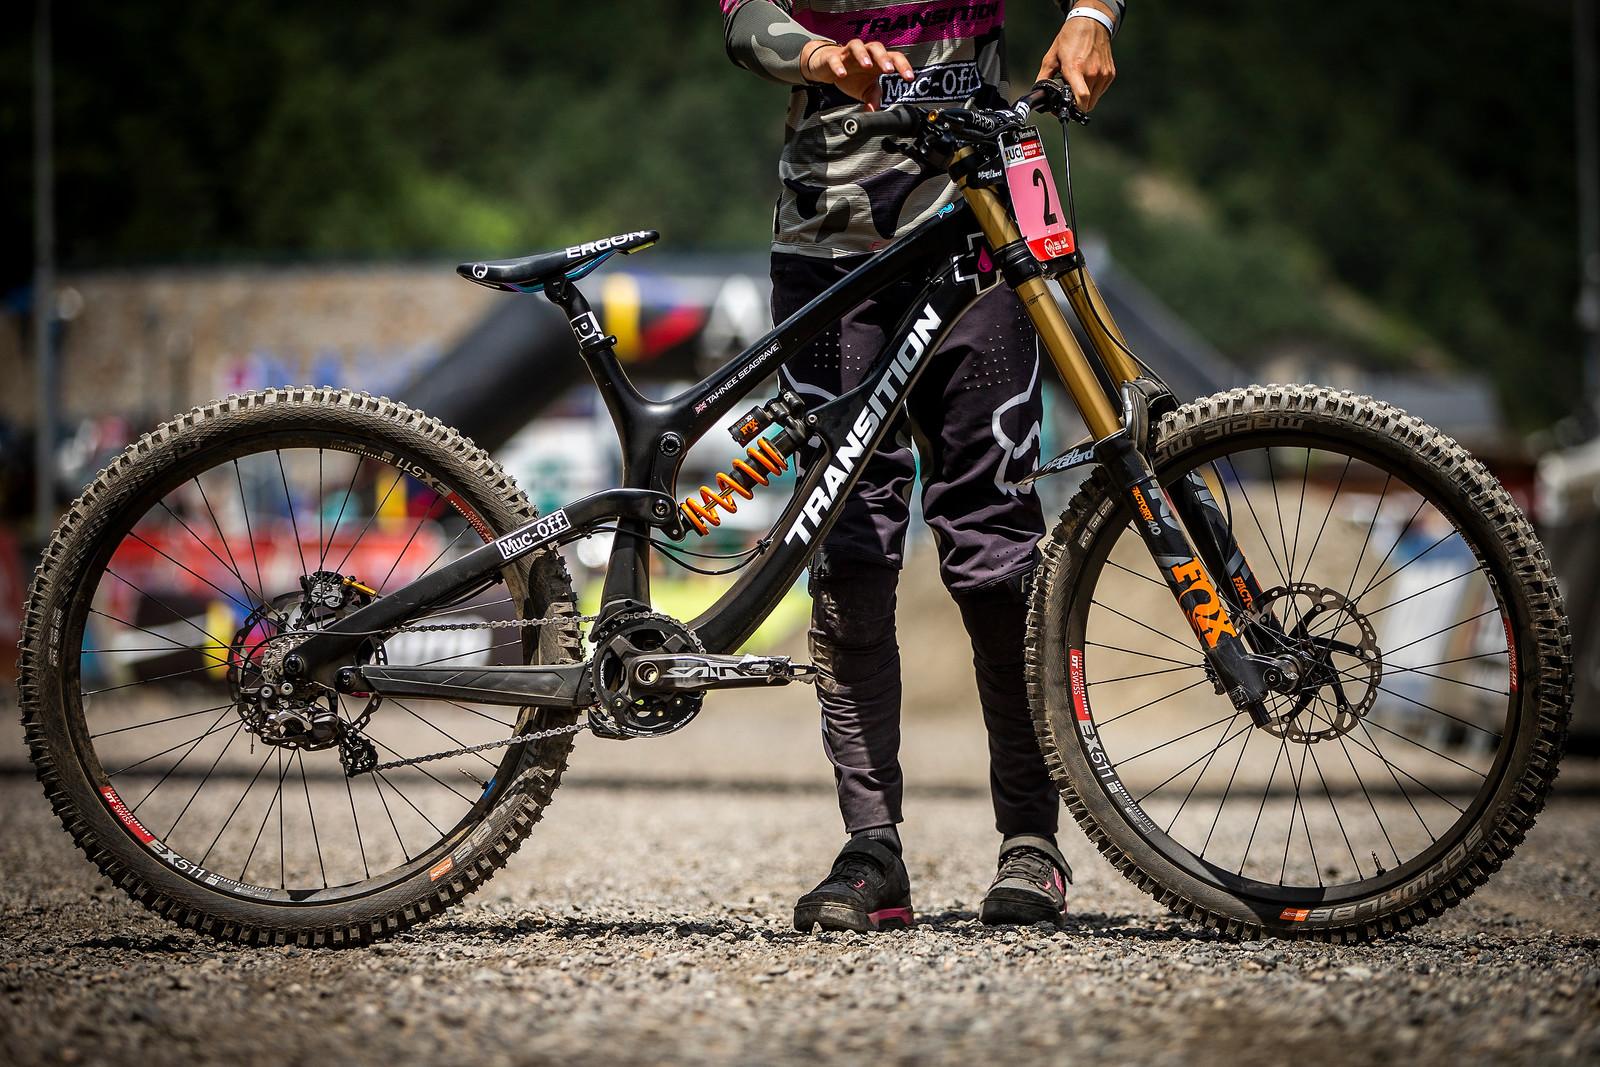 WINNING BIKE - Tahnee Seagrave's Transition TR11 - WINNING BIKE - Tahnee Seagrave's Transition TR11 - Mountain Biking Pictures - Vital MTB